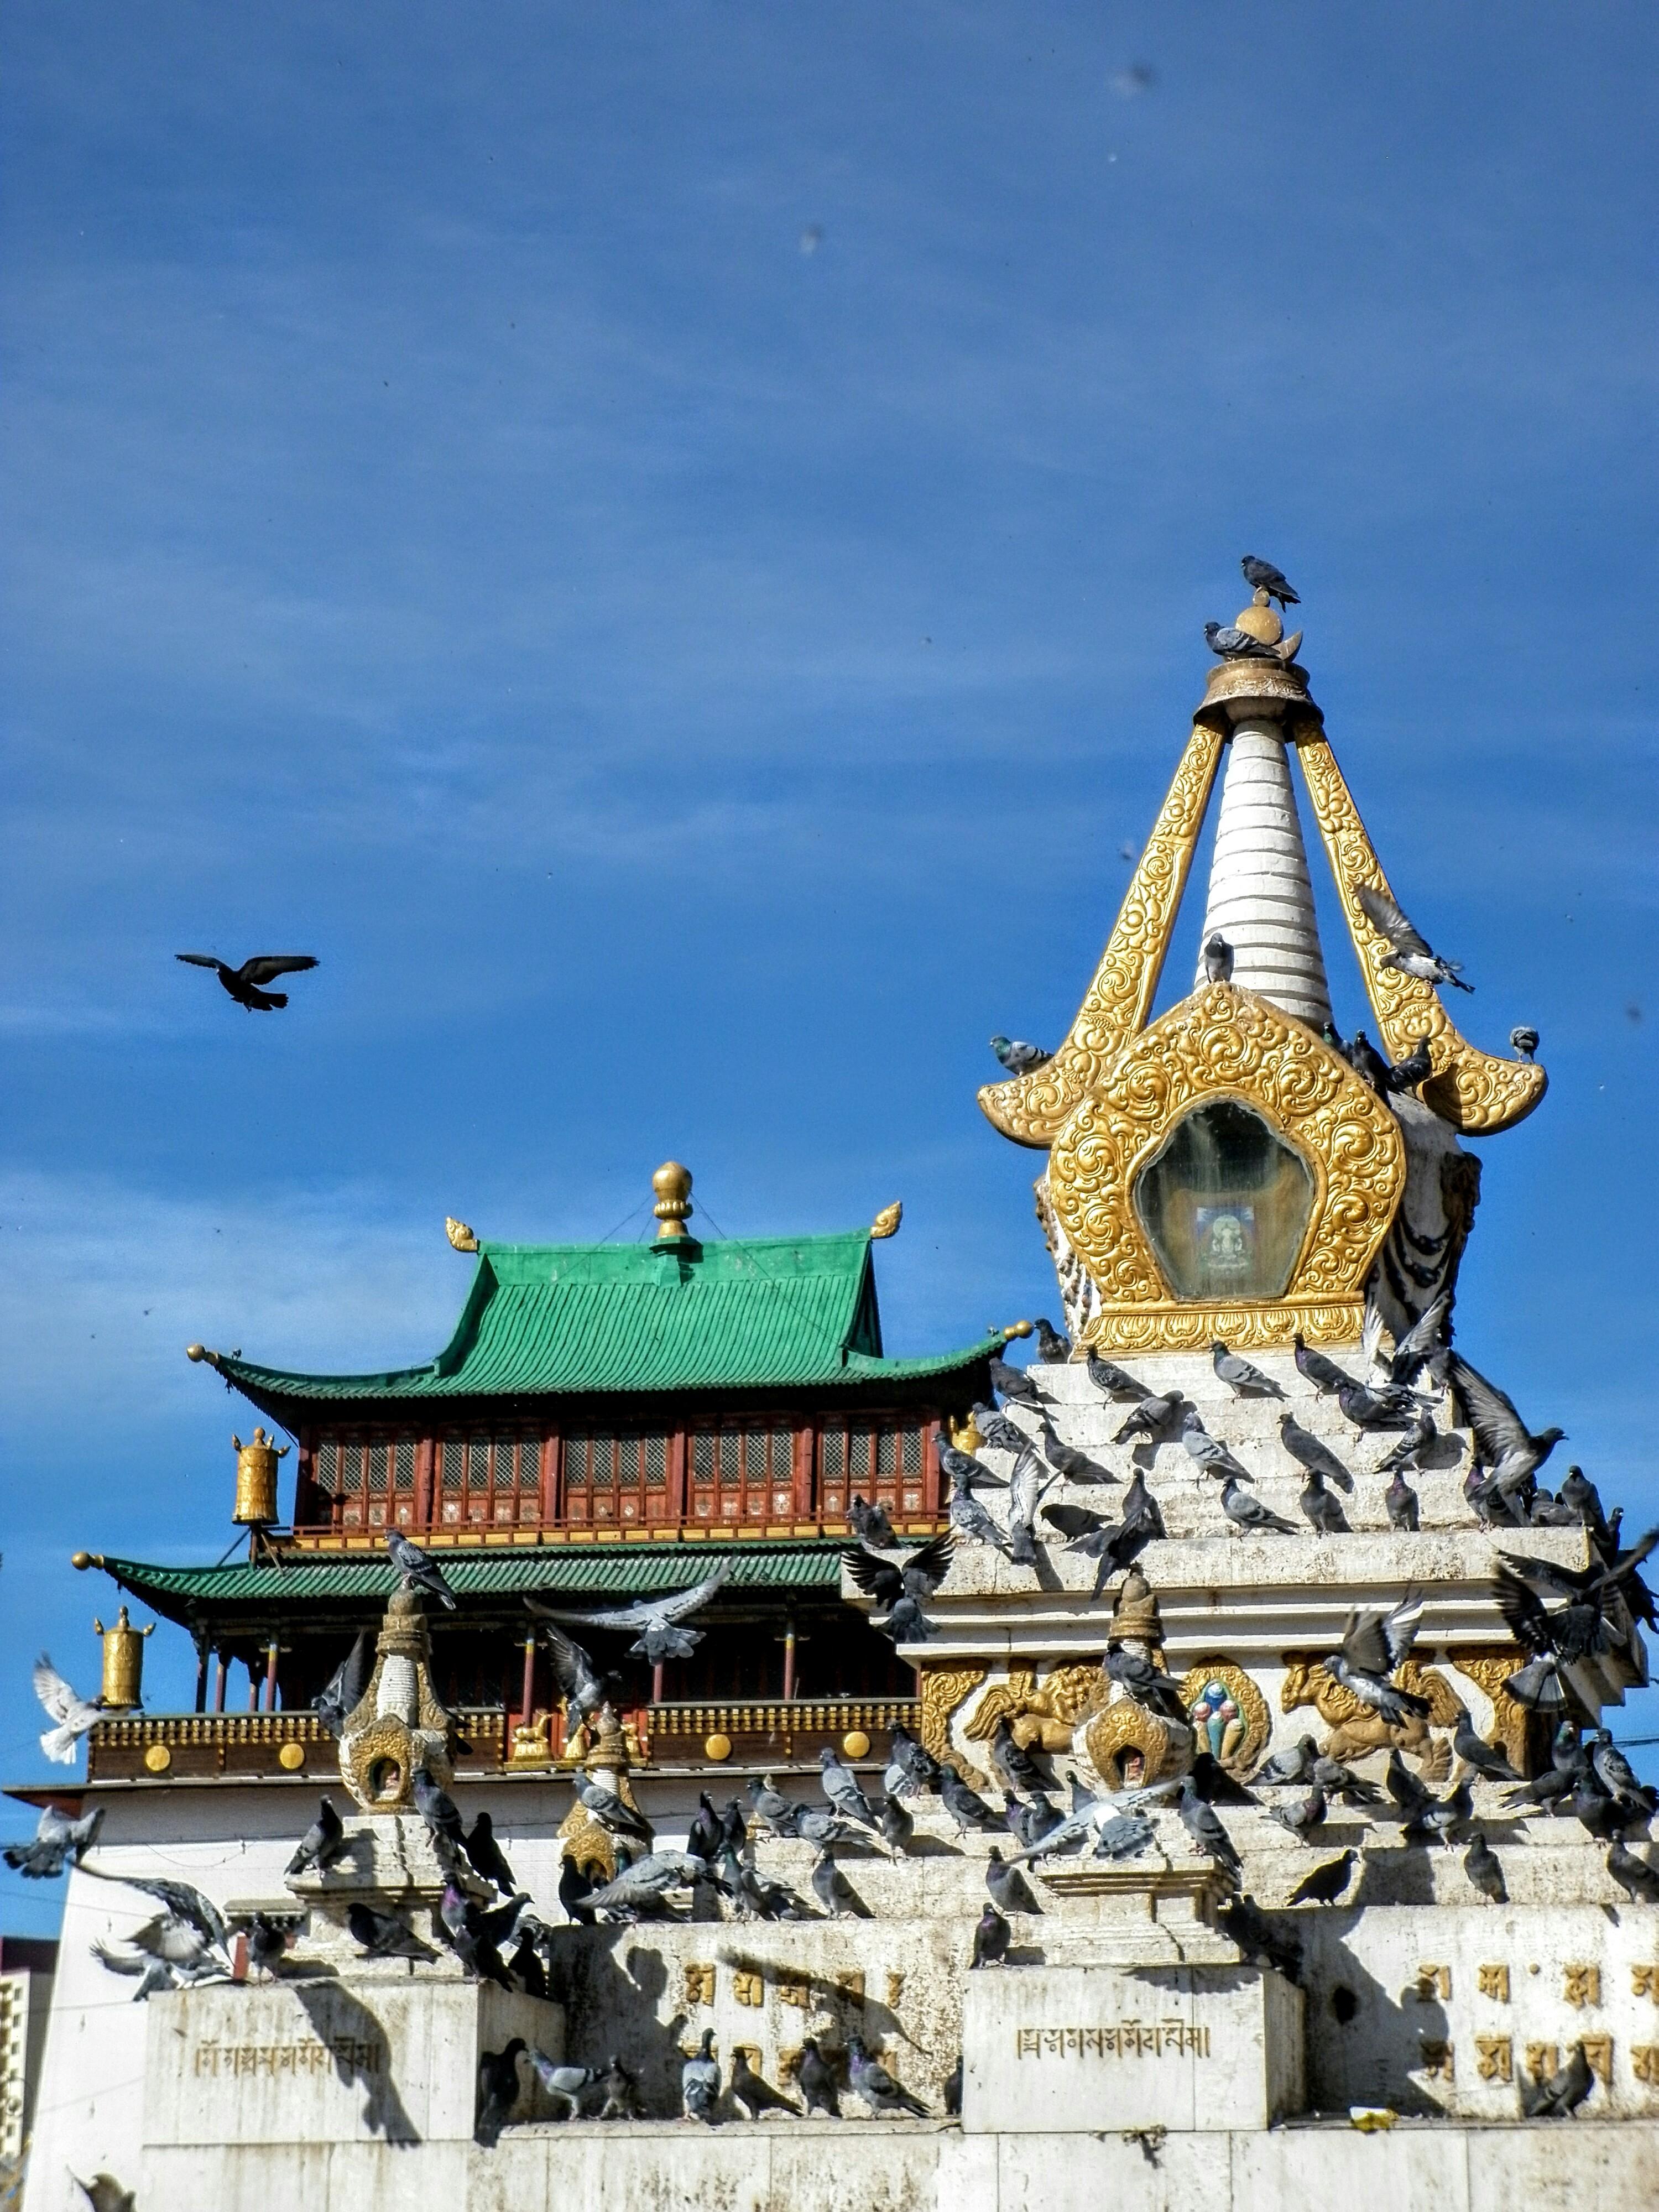 Gandan Khiid Monastery in Ulan Bator, the capital of Mongolia